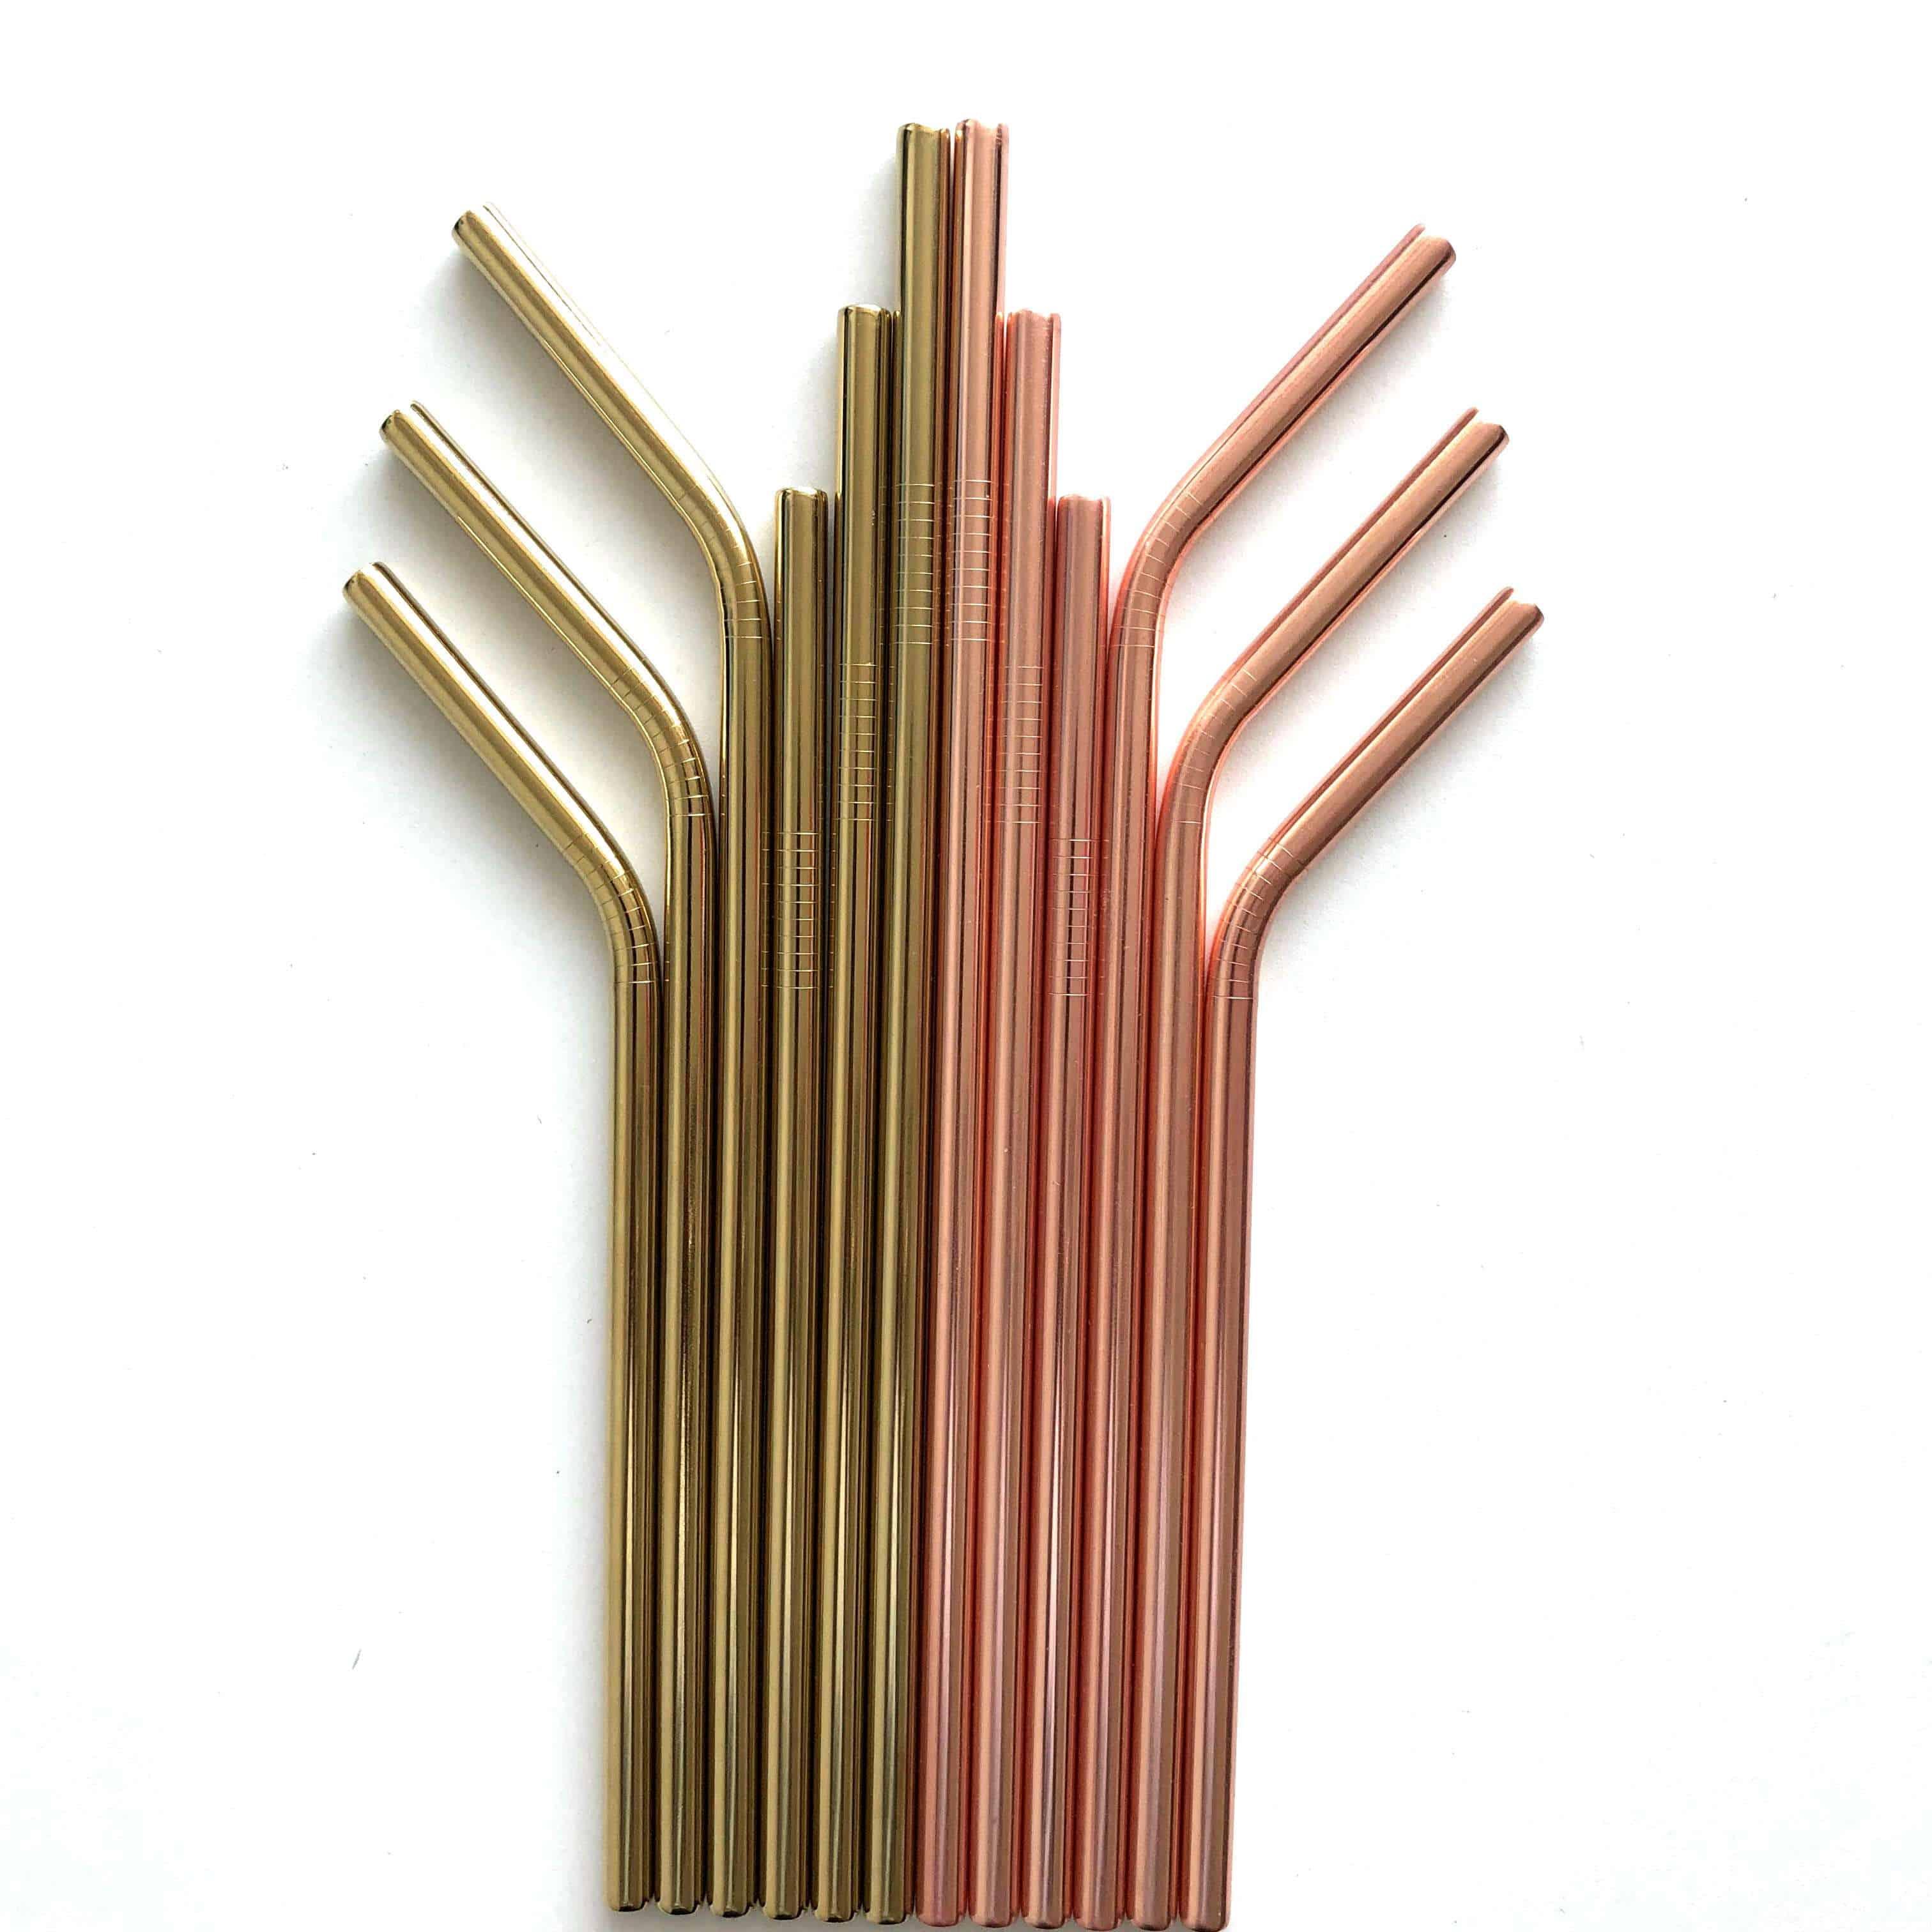 stainless steel drinking straws supplier